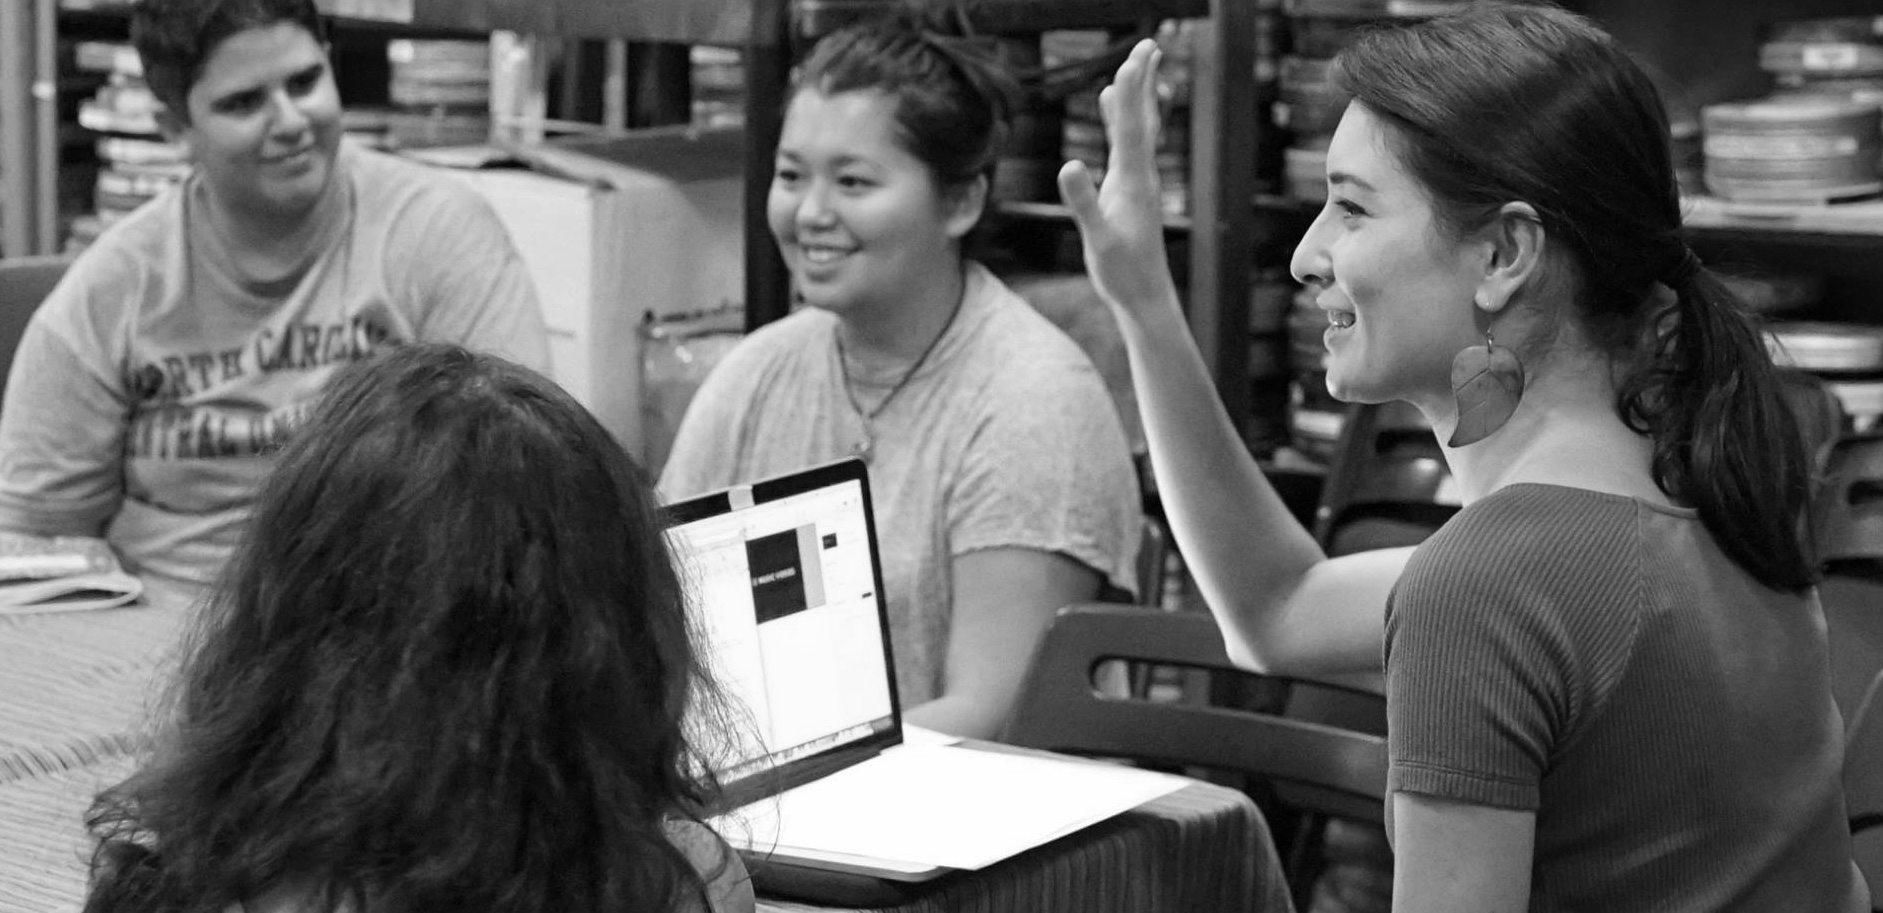 Emily teaching 2017 workshop at Echo Park Film Center for Action!